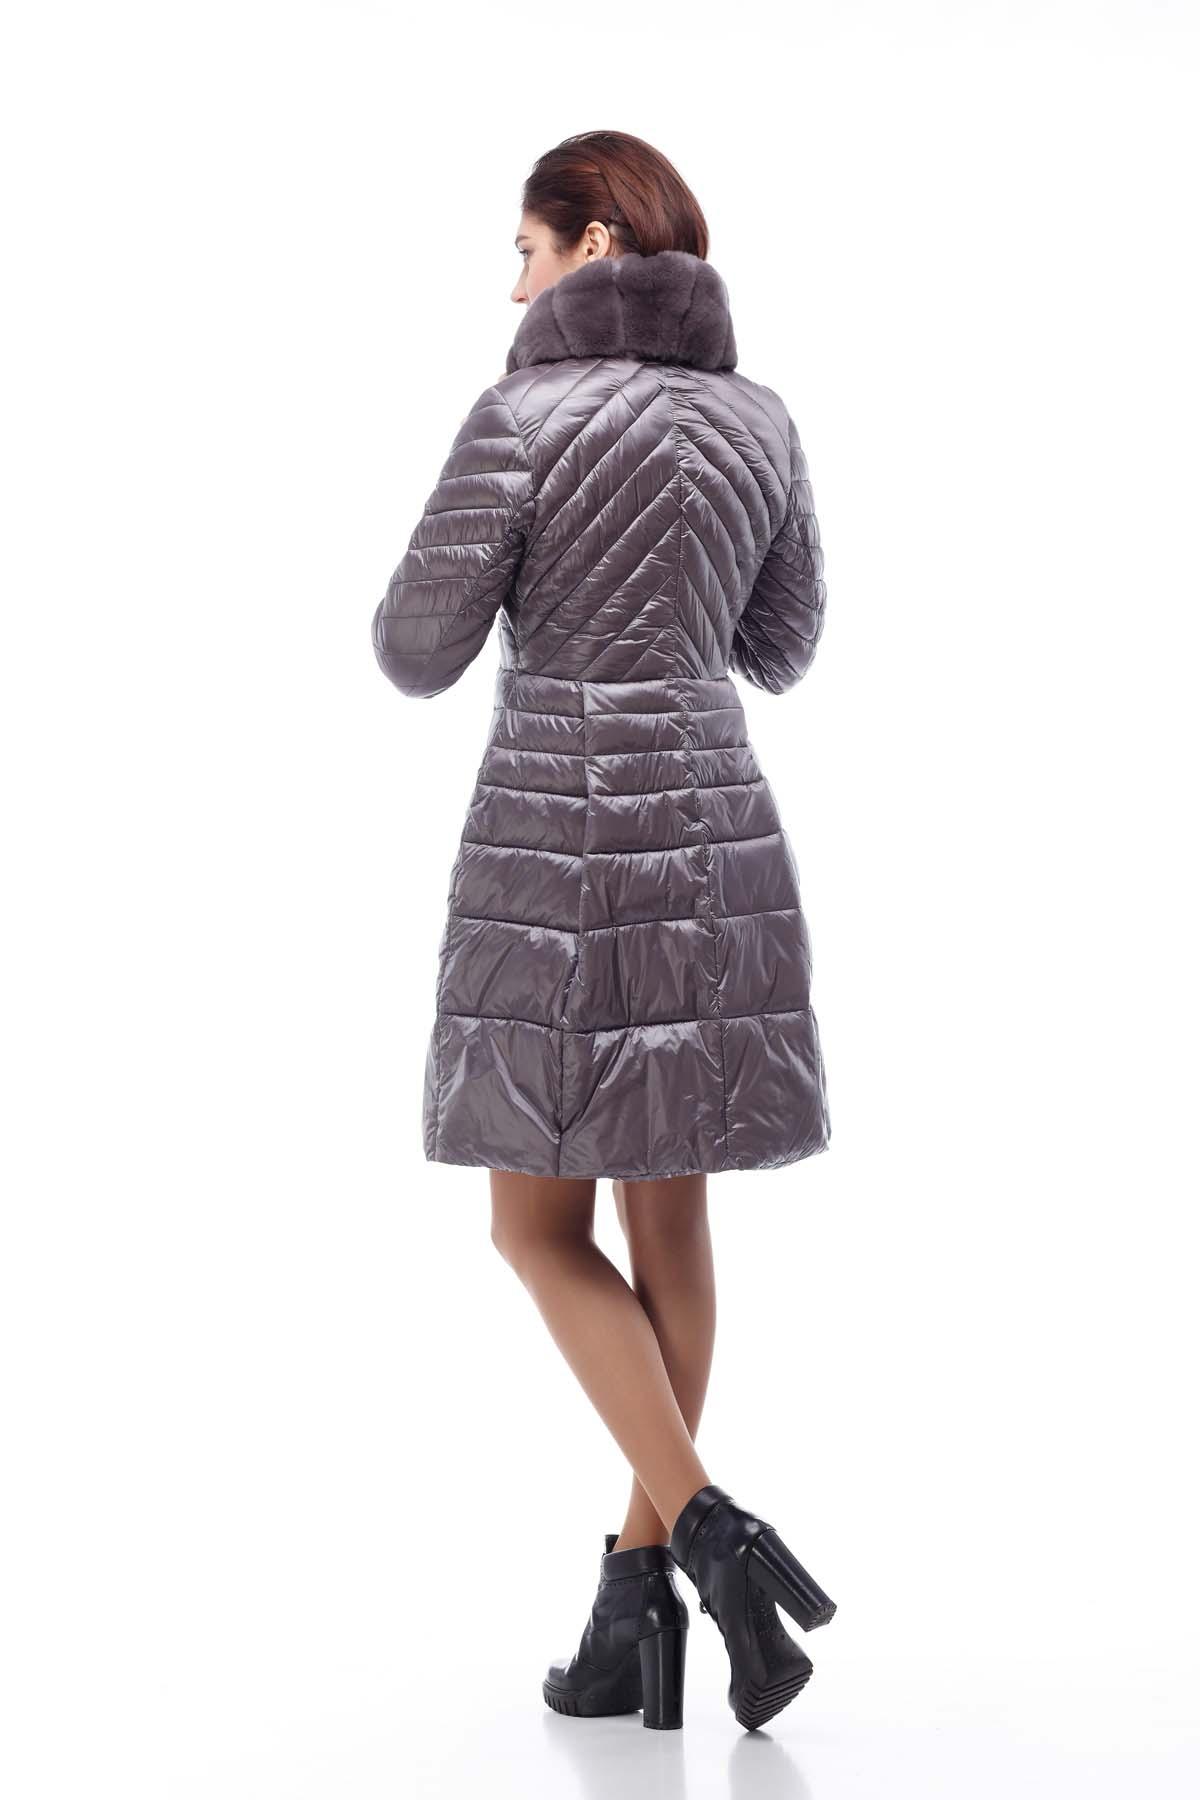 Пальто стьогане Аврора Зима Аметист